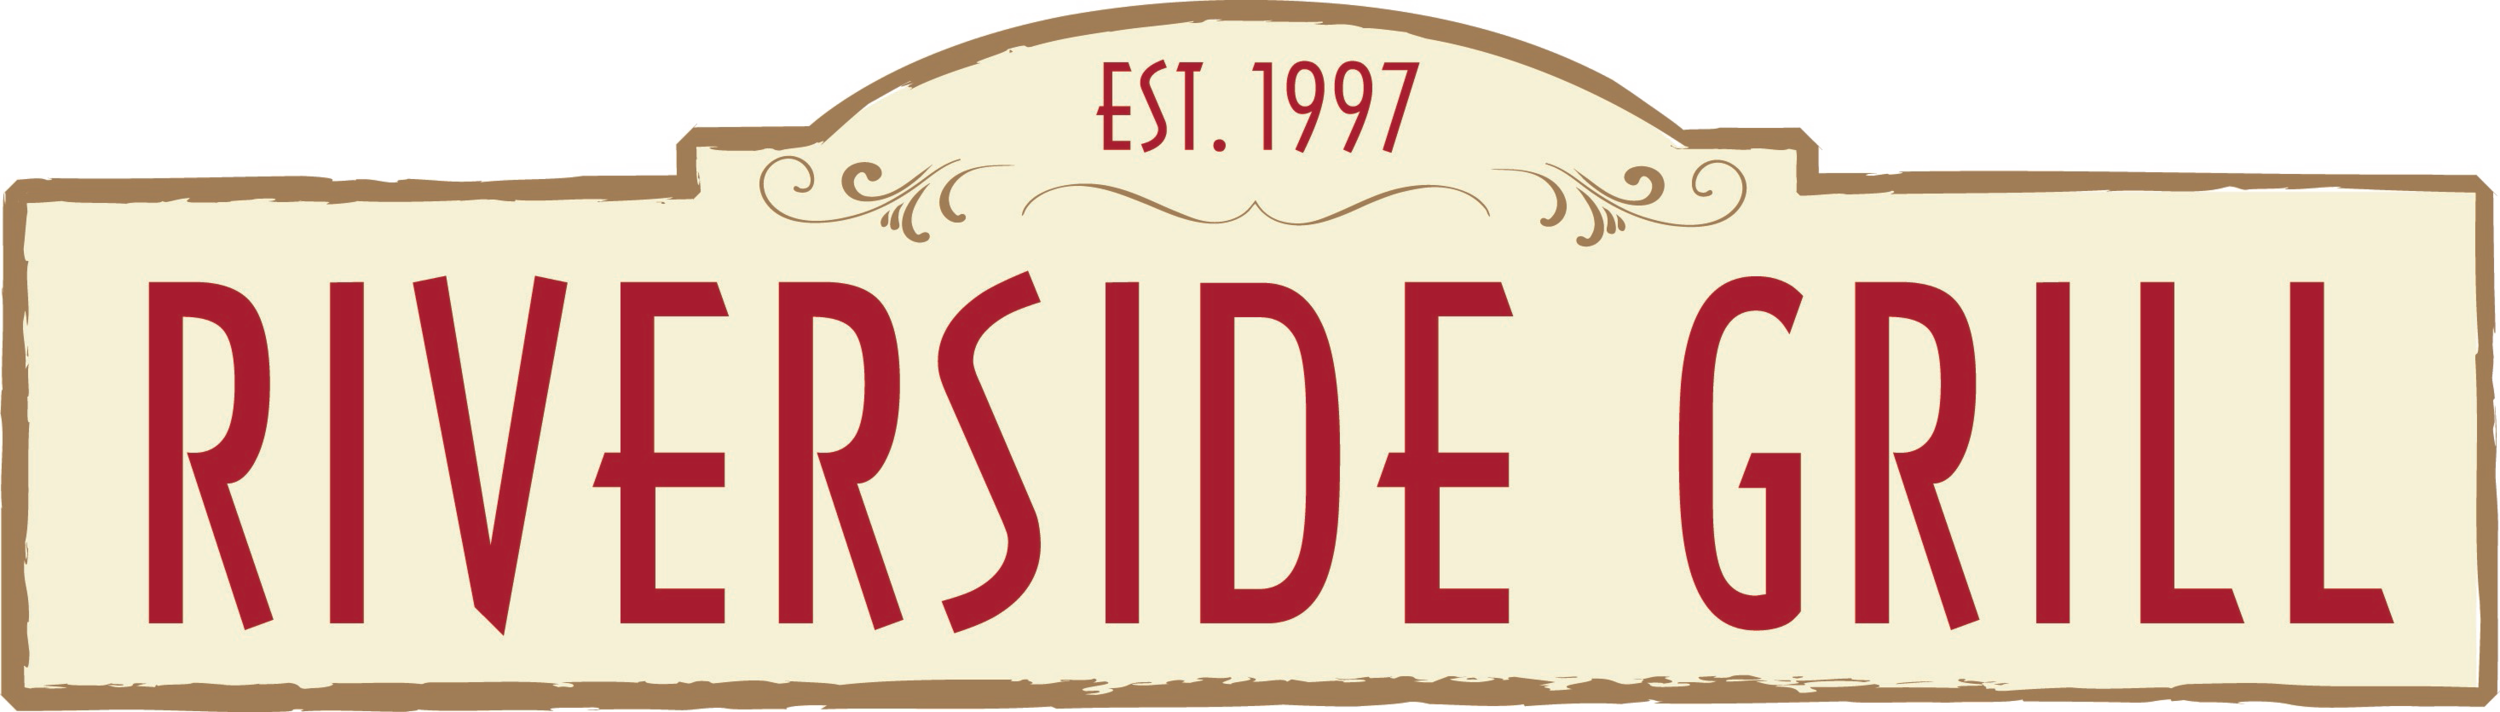 Riverside-Grill-Logo_PNG.png